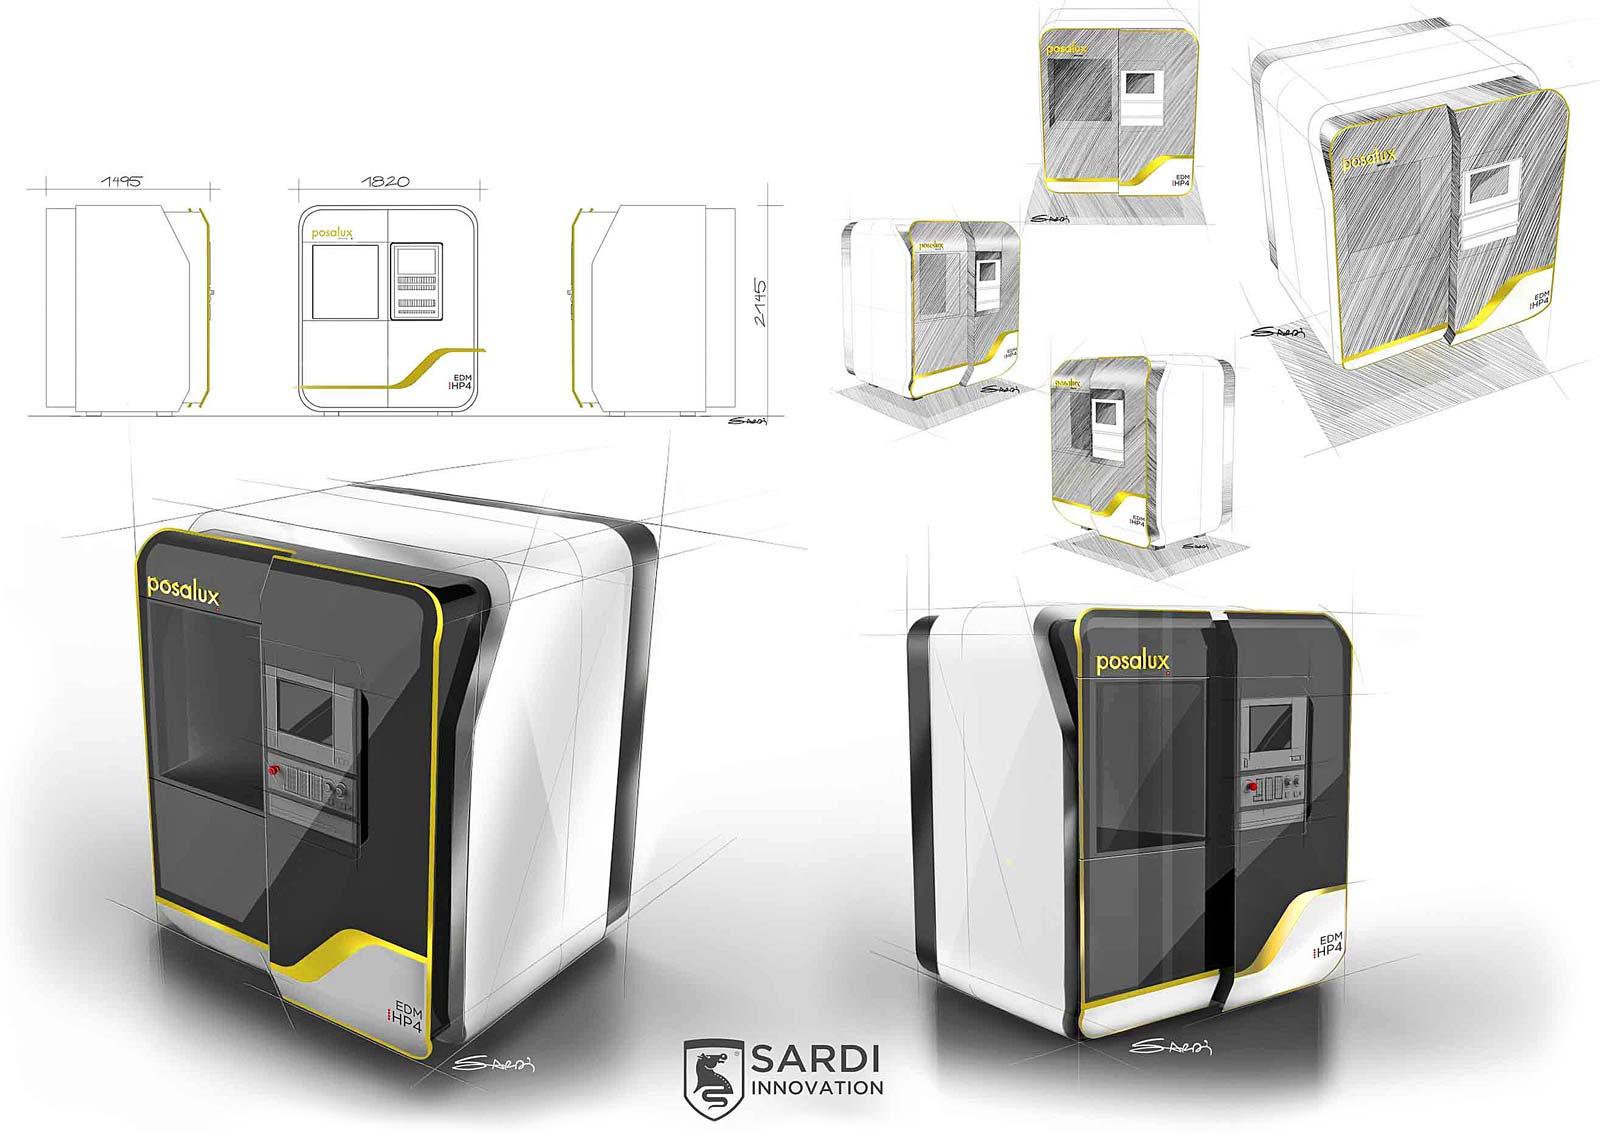 Design Posalux